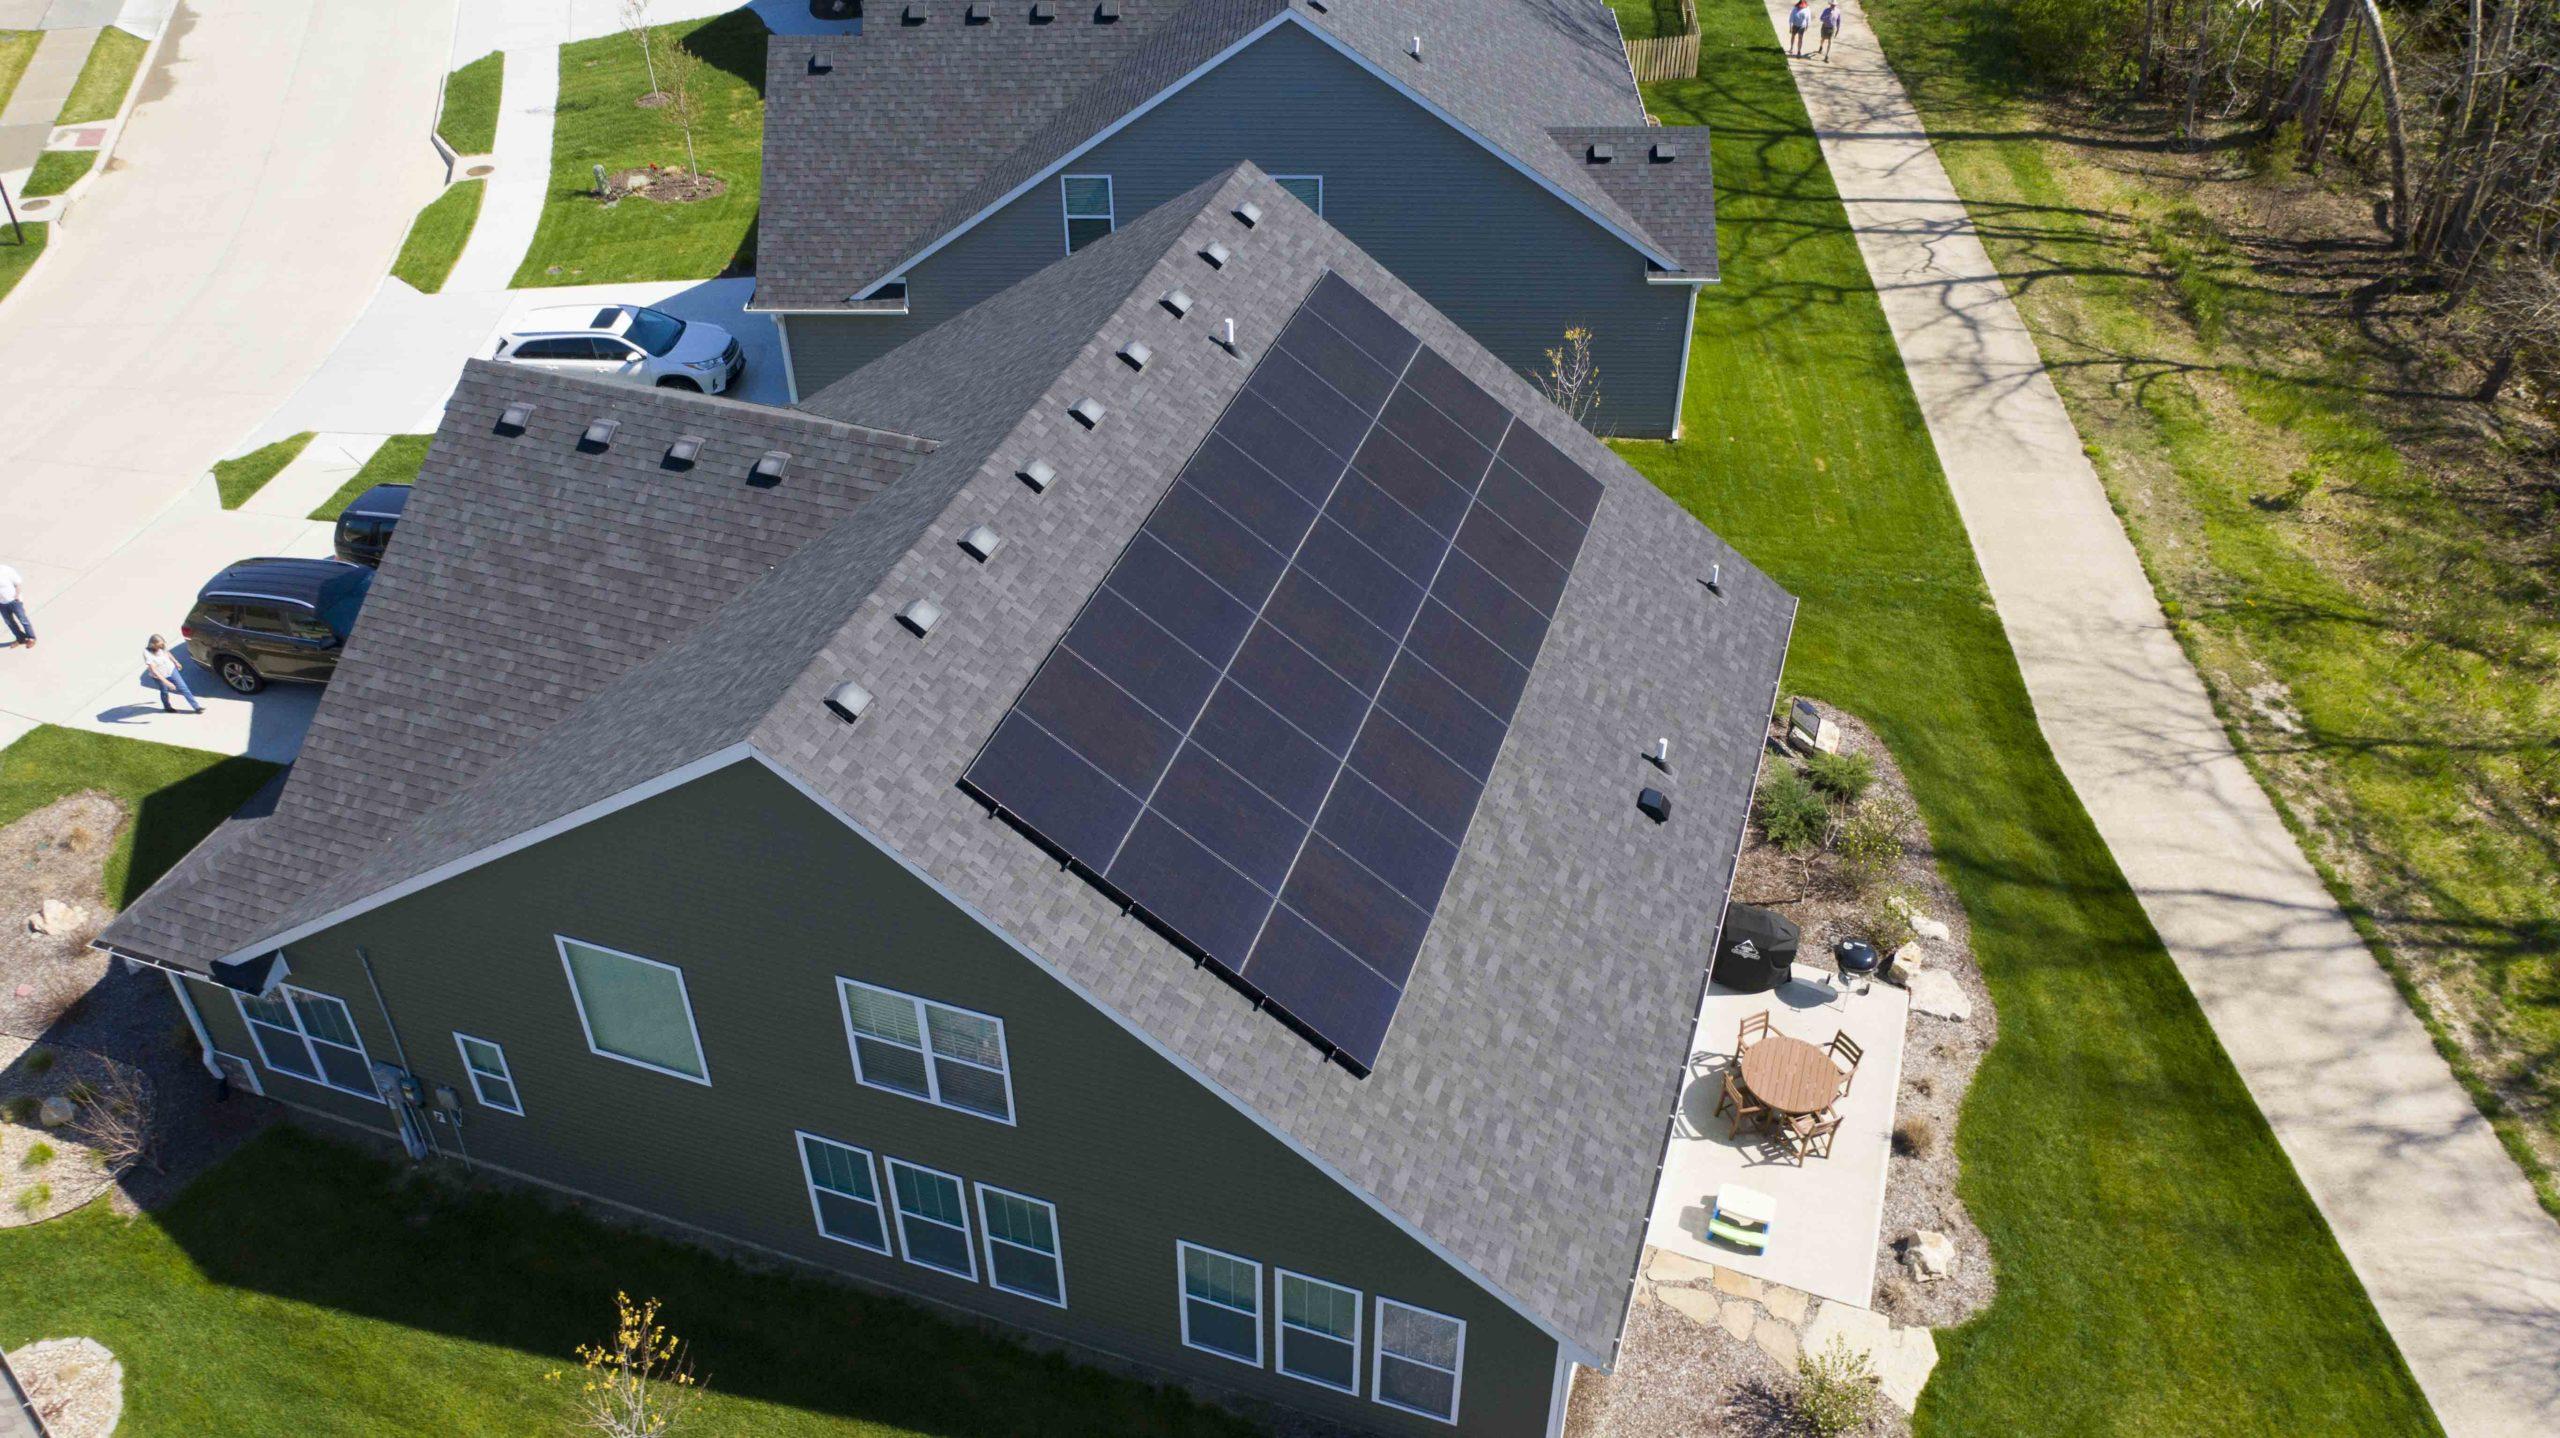 Bob and Karen's solar panel install facing south in southwest Columbia, Missouri.